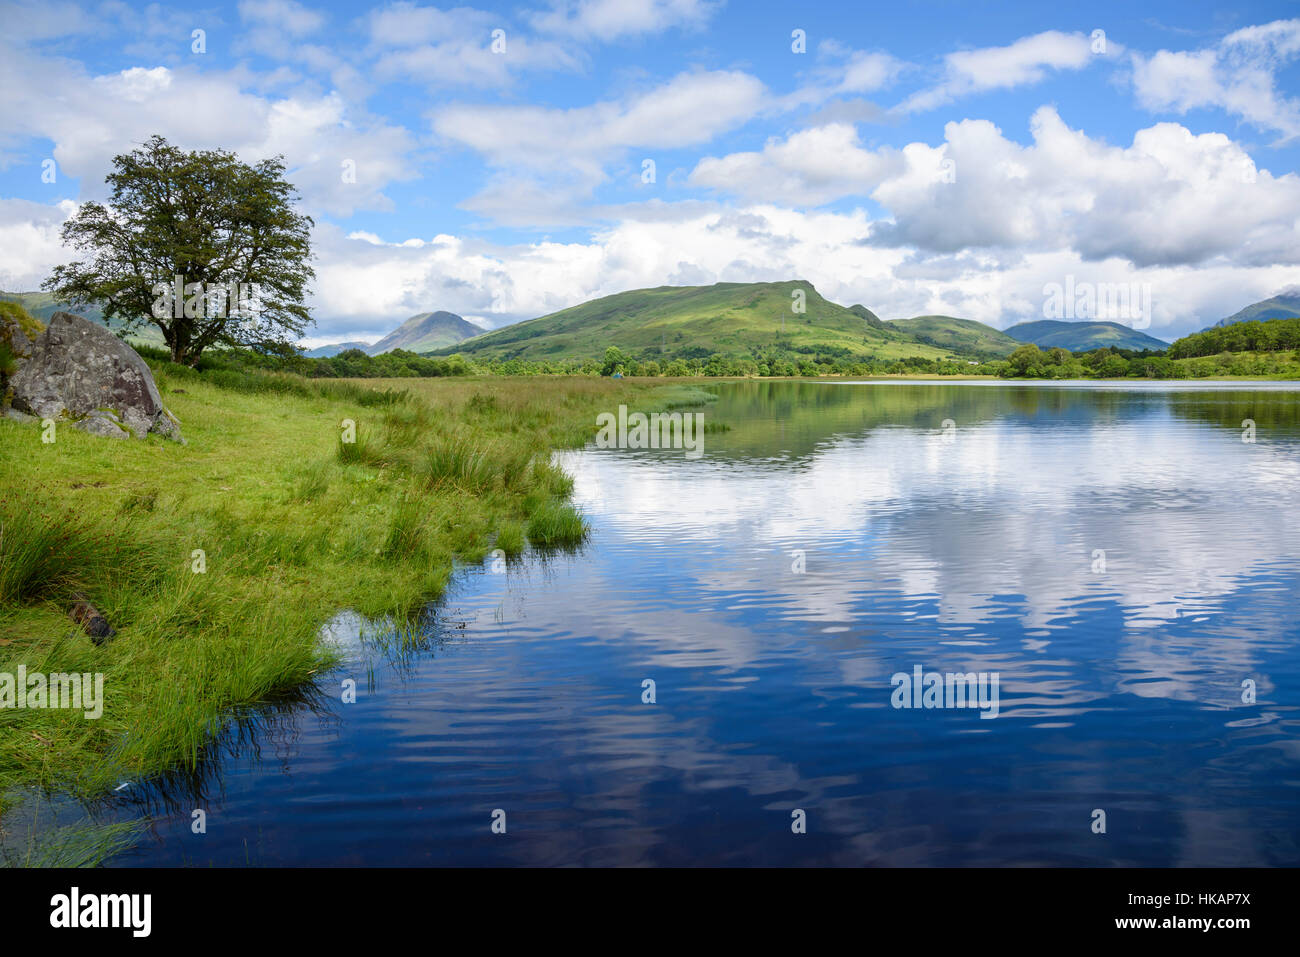 Loch Awe, Argyll & Bute, Scotland - Stock Image